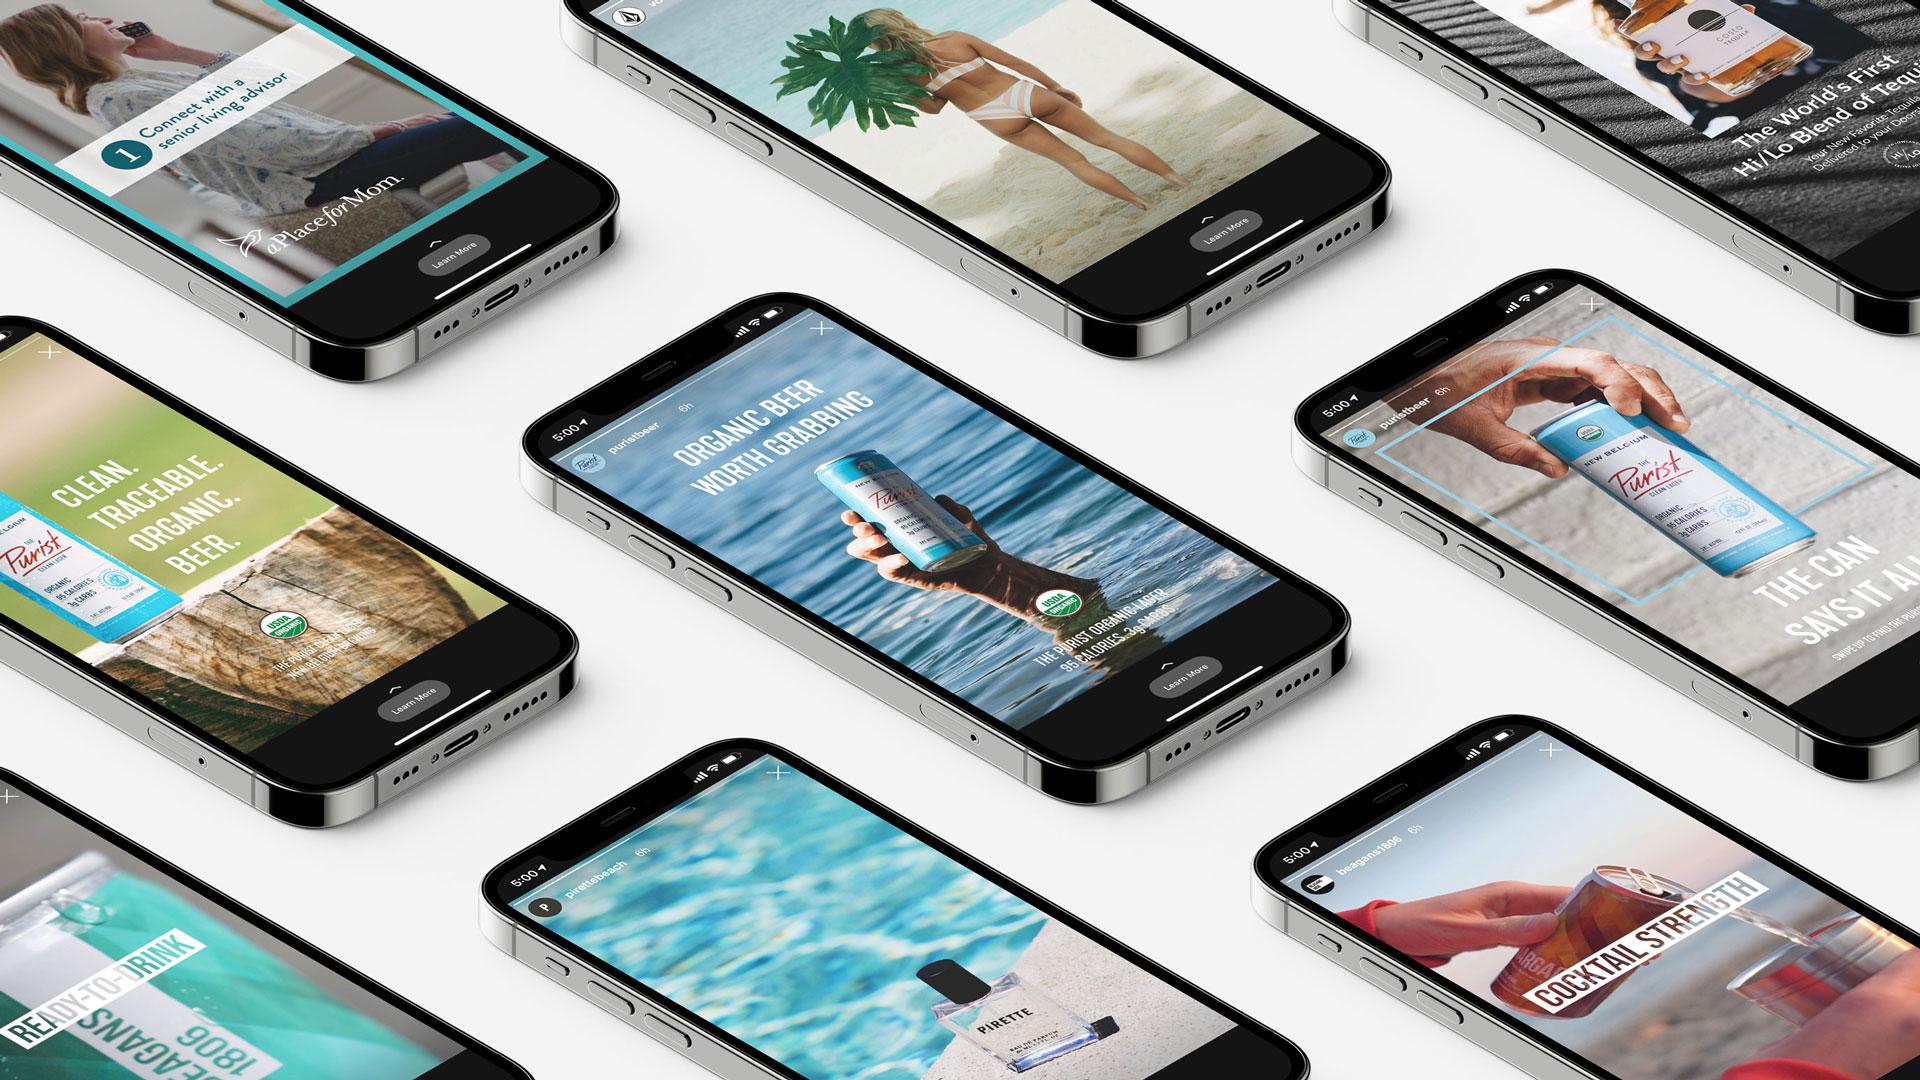 KP-Ad-Creative-iPhone-Grid-Mock-R4-16-9-Homepage